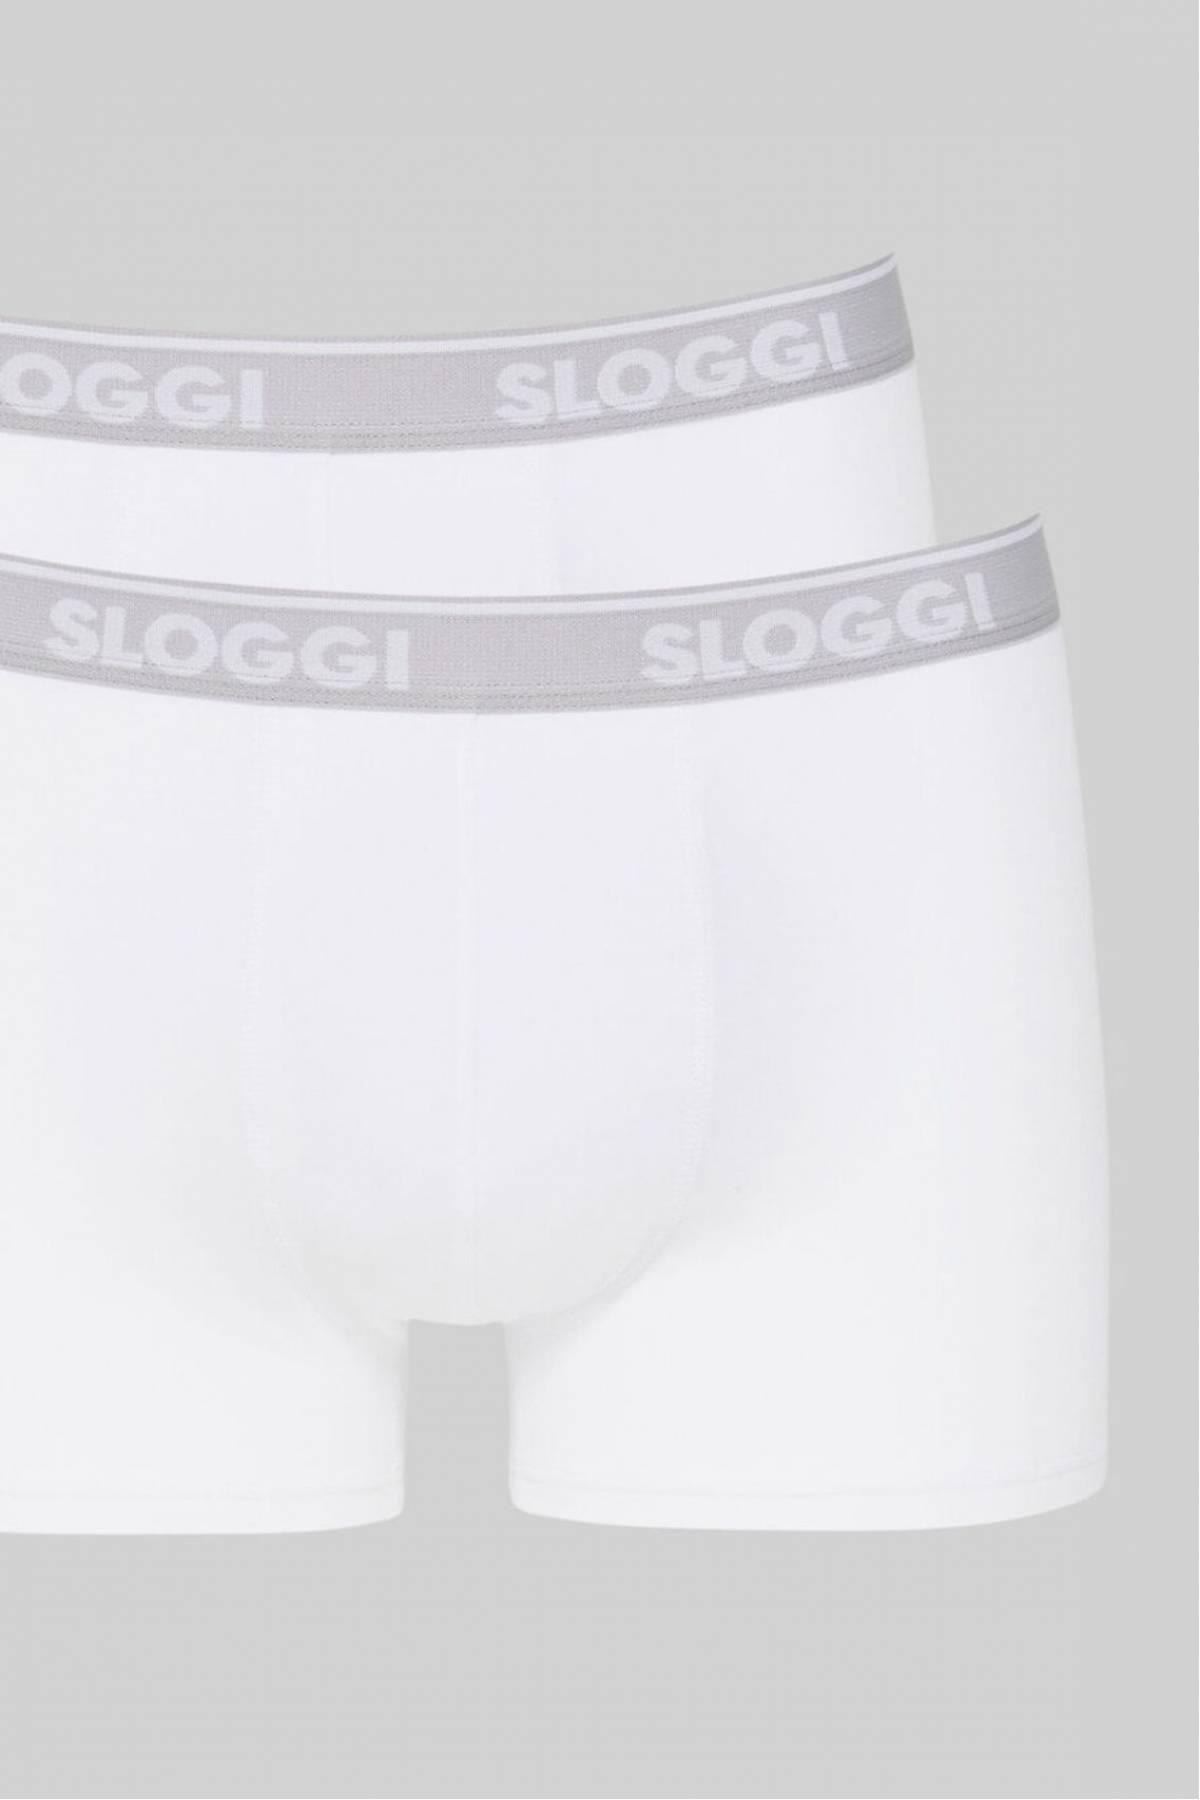 боксеры (2 шт) Sloggi